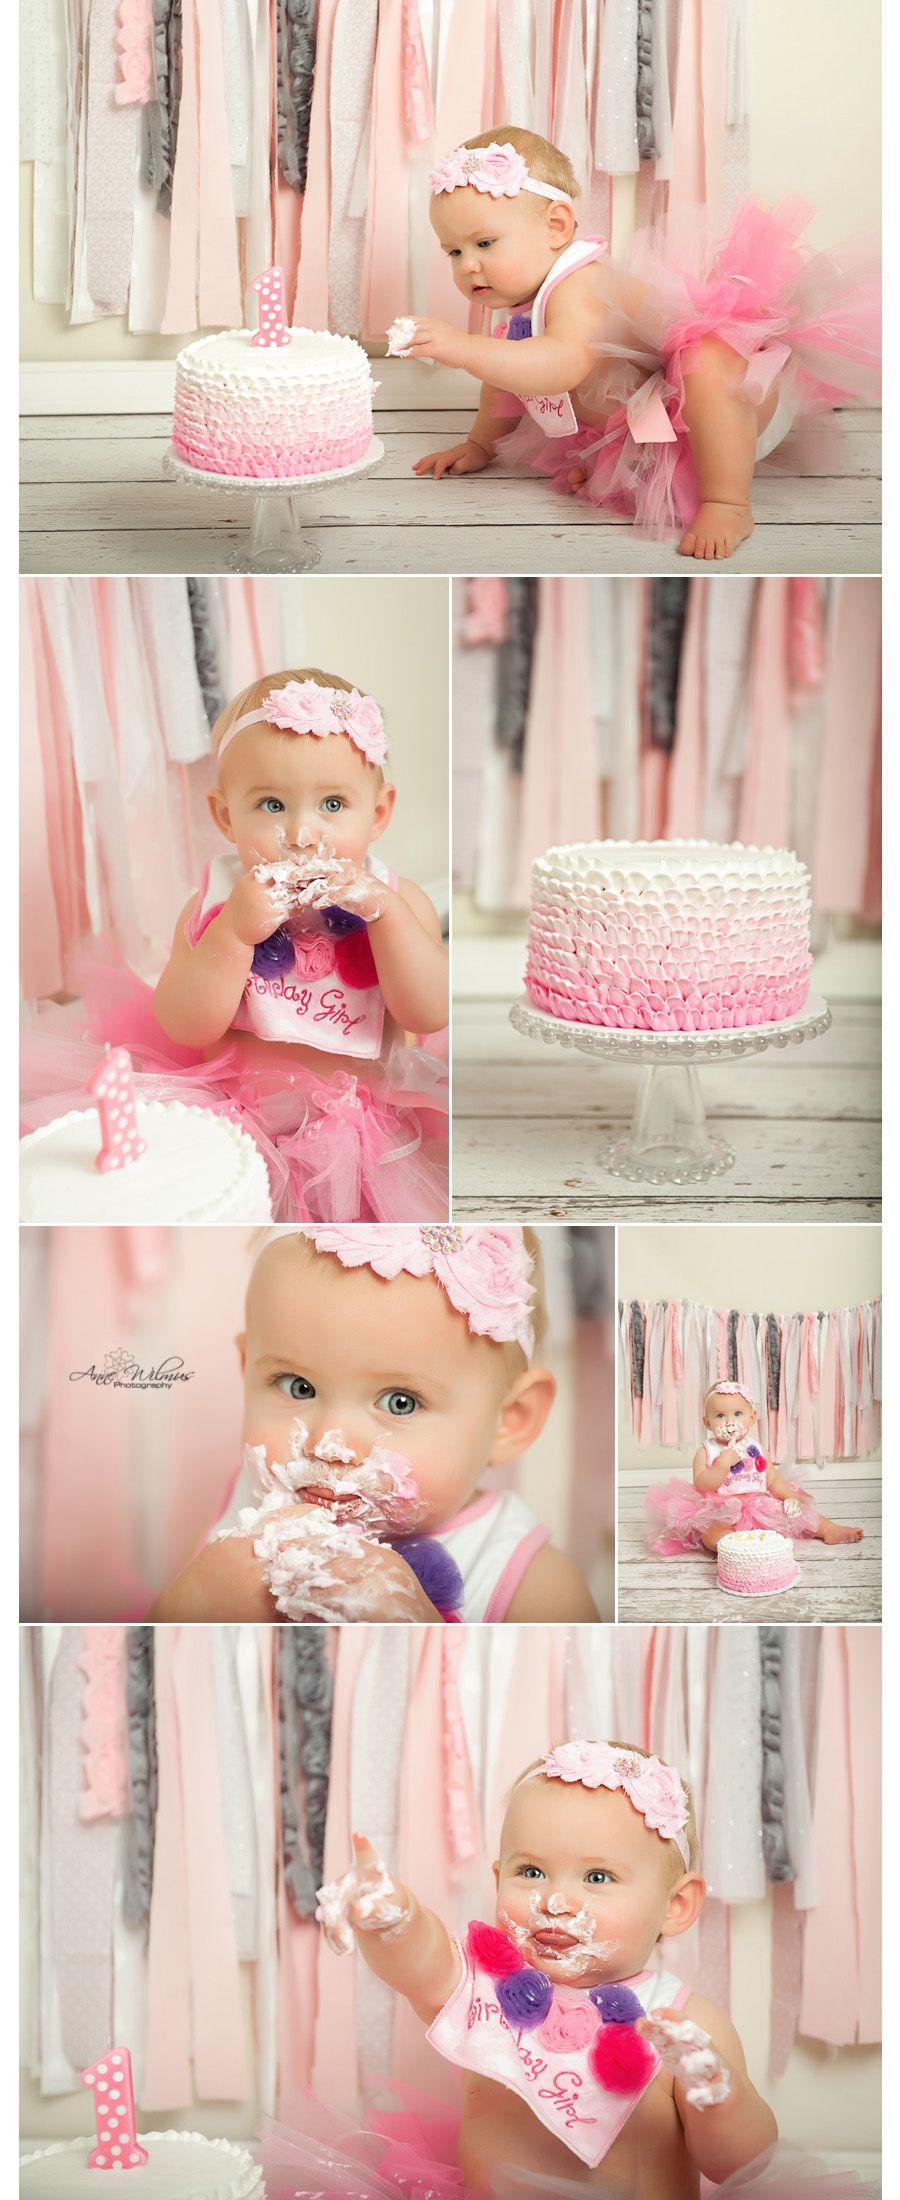 Baby Children Baby Birthday Photography Baby Photoshoot Baby Photography